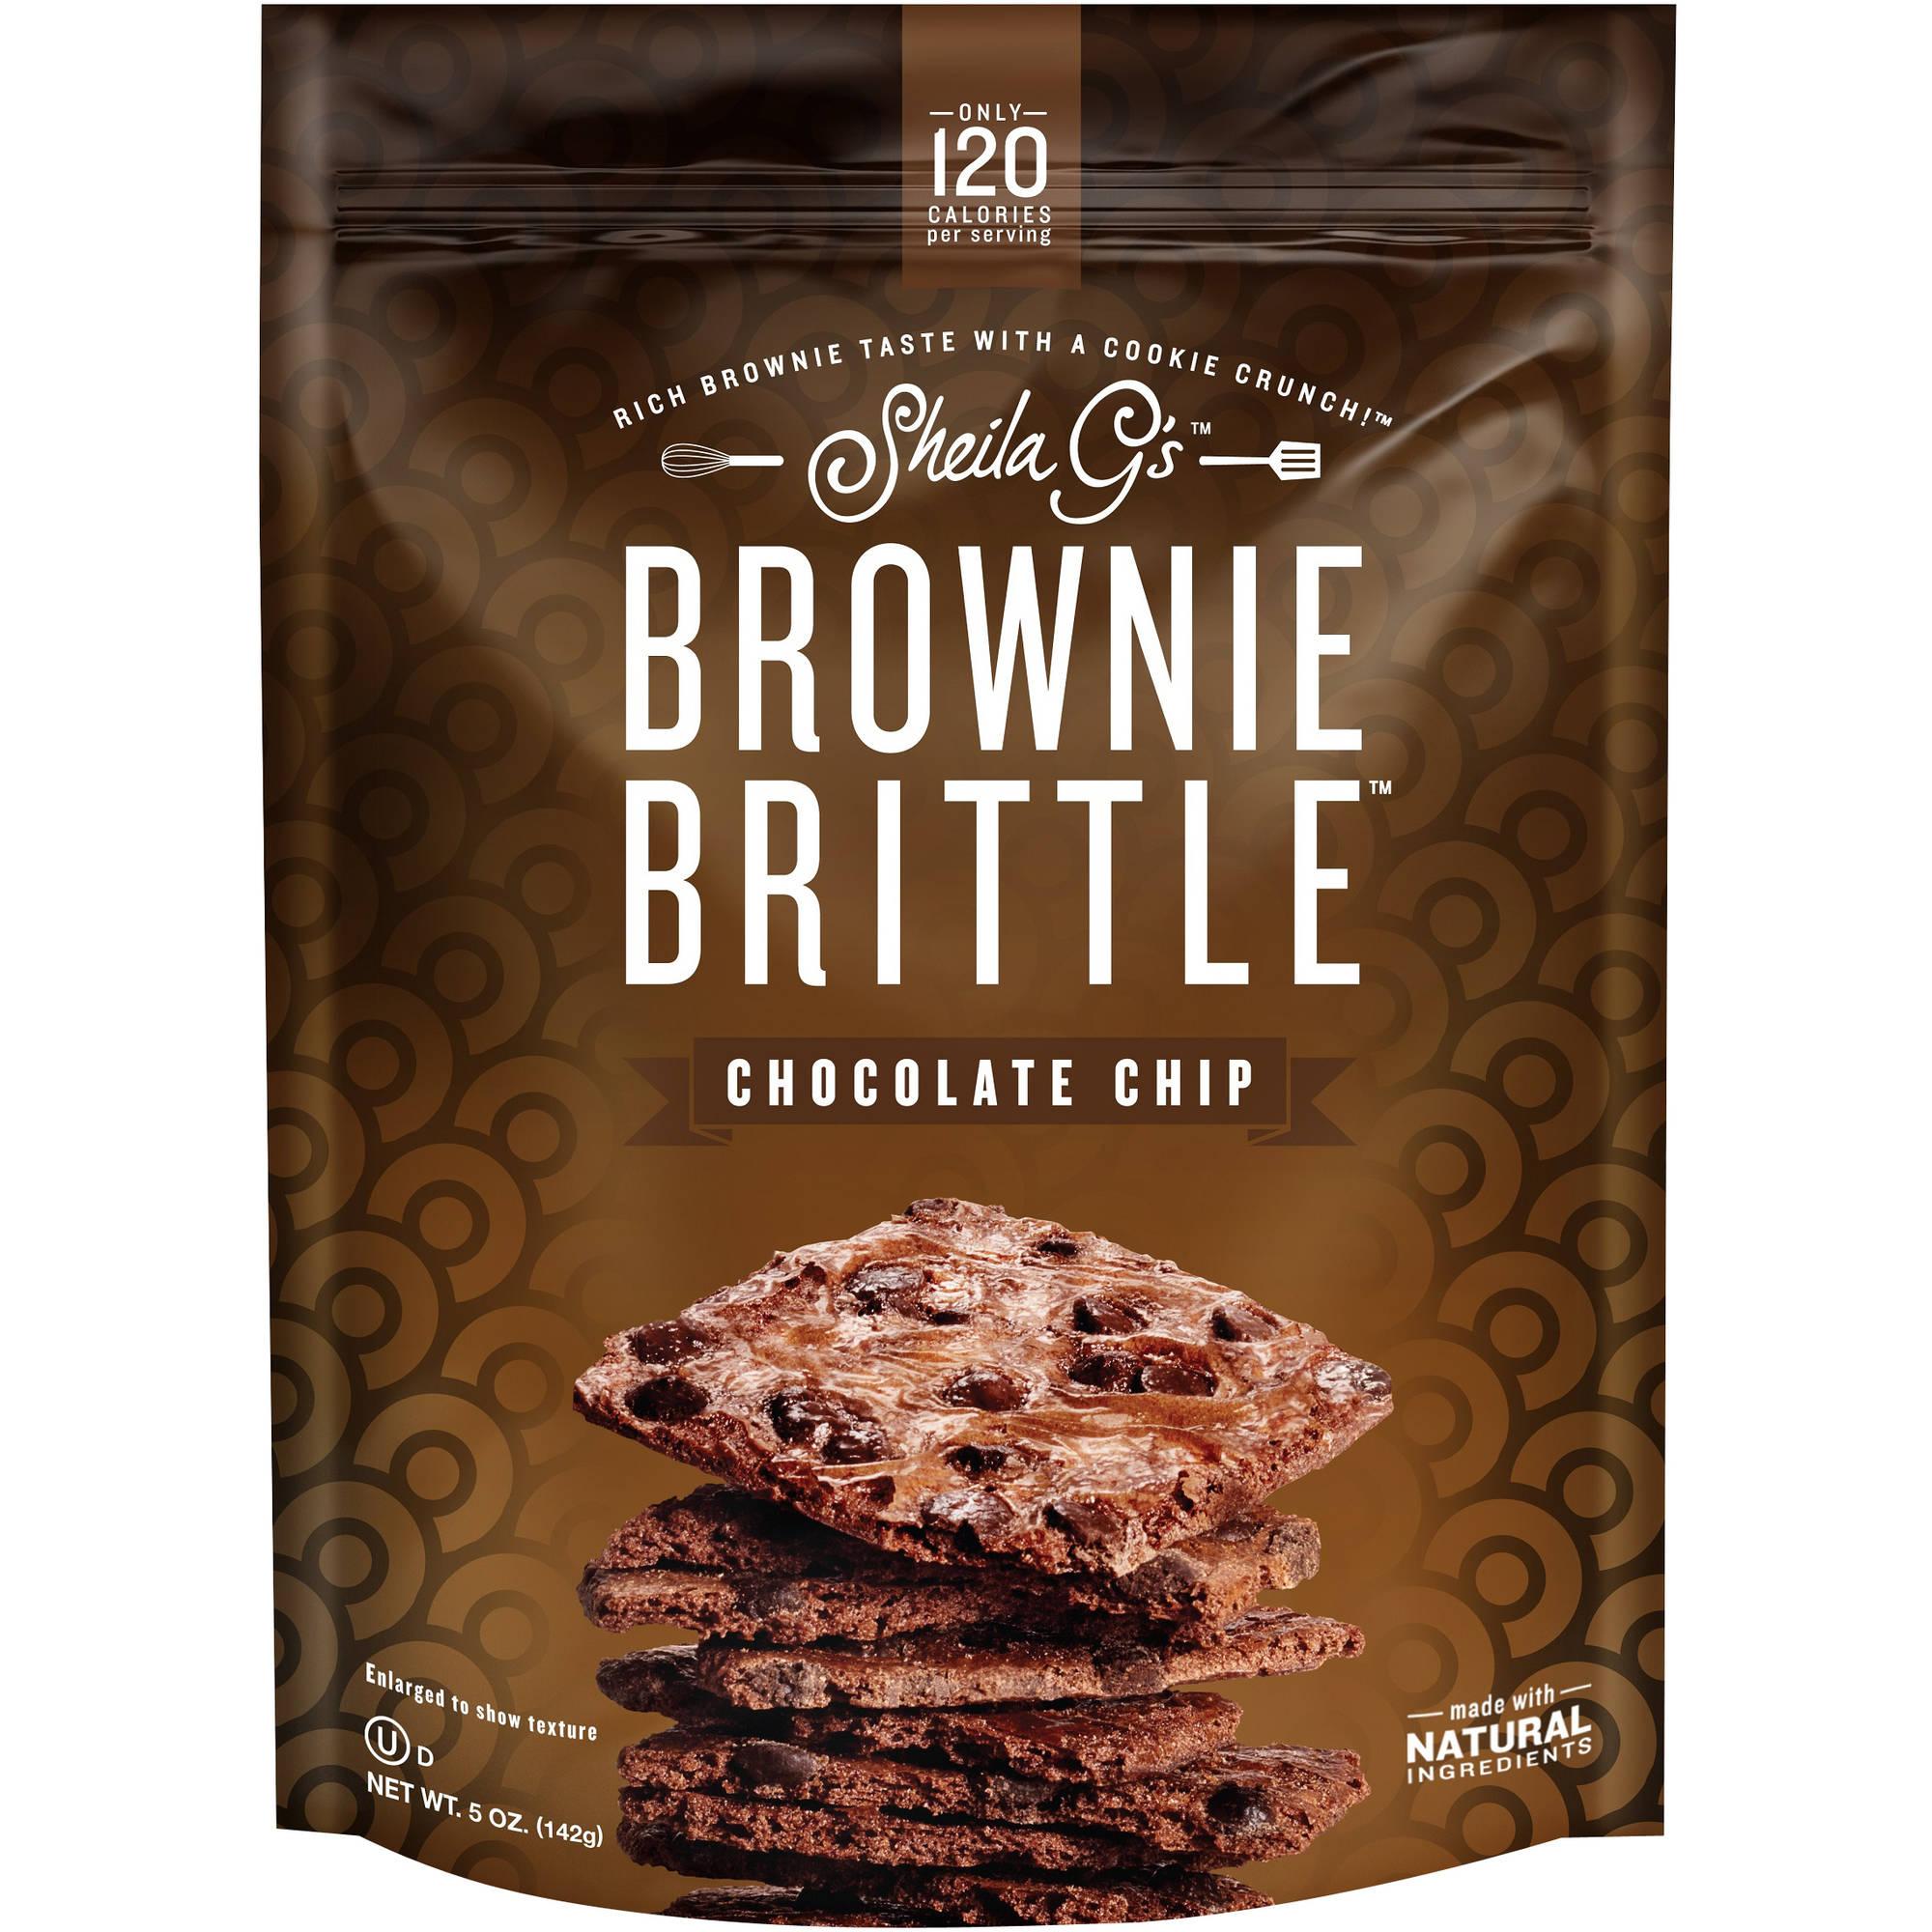 Sheila G's Chocolate Chip Brownie Brittle, 5 oz